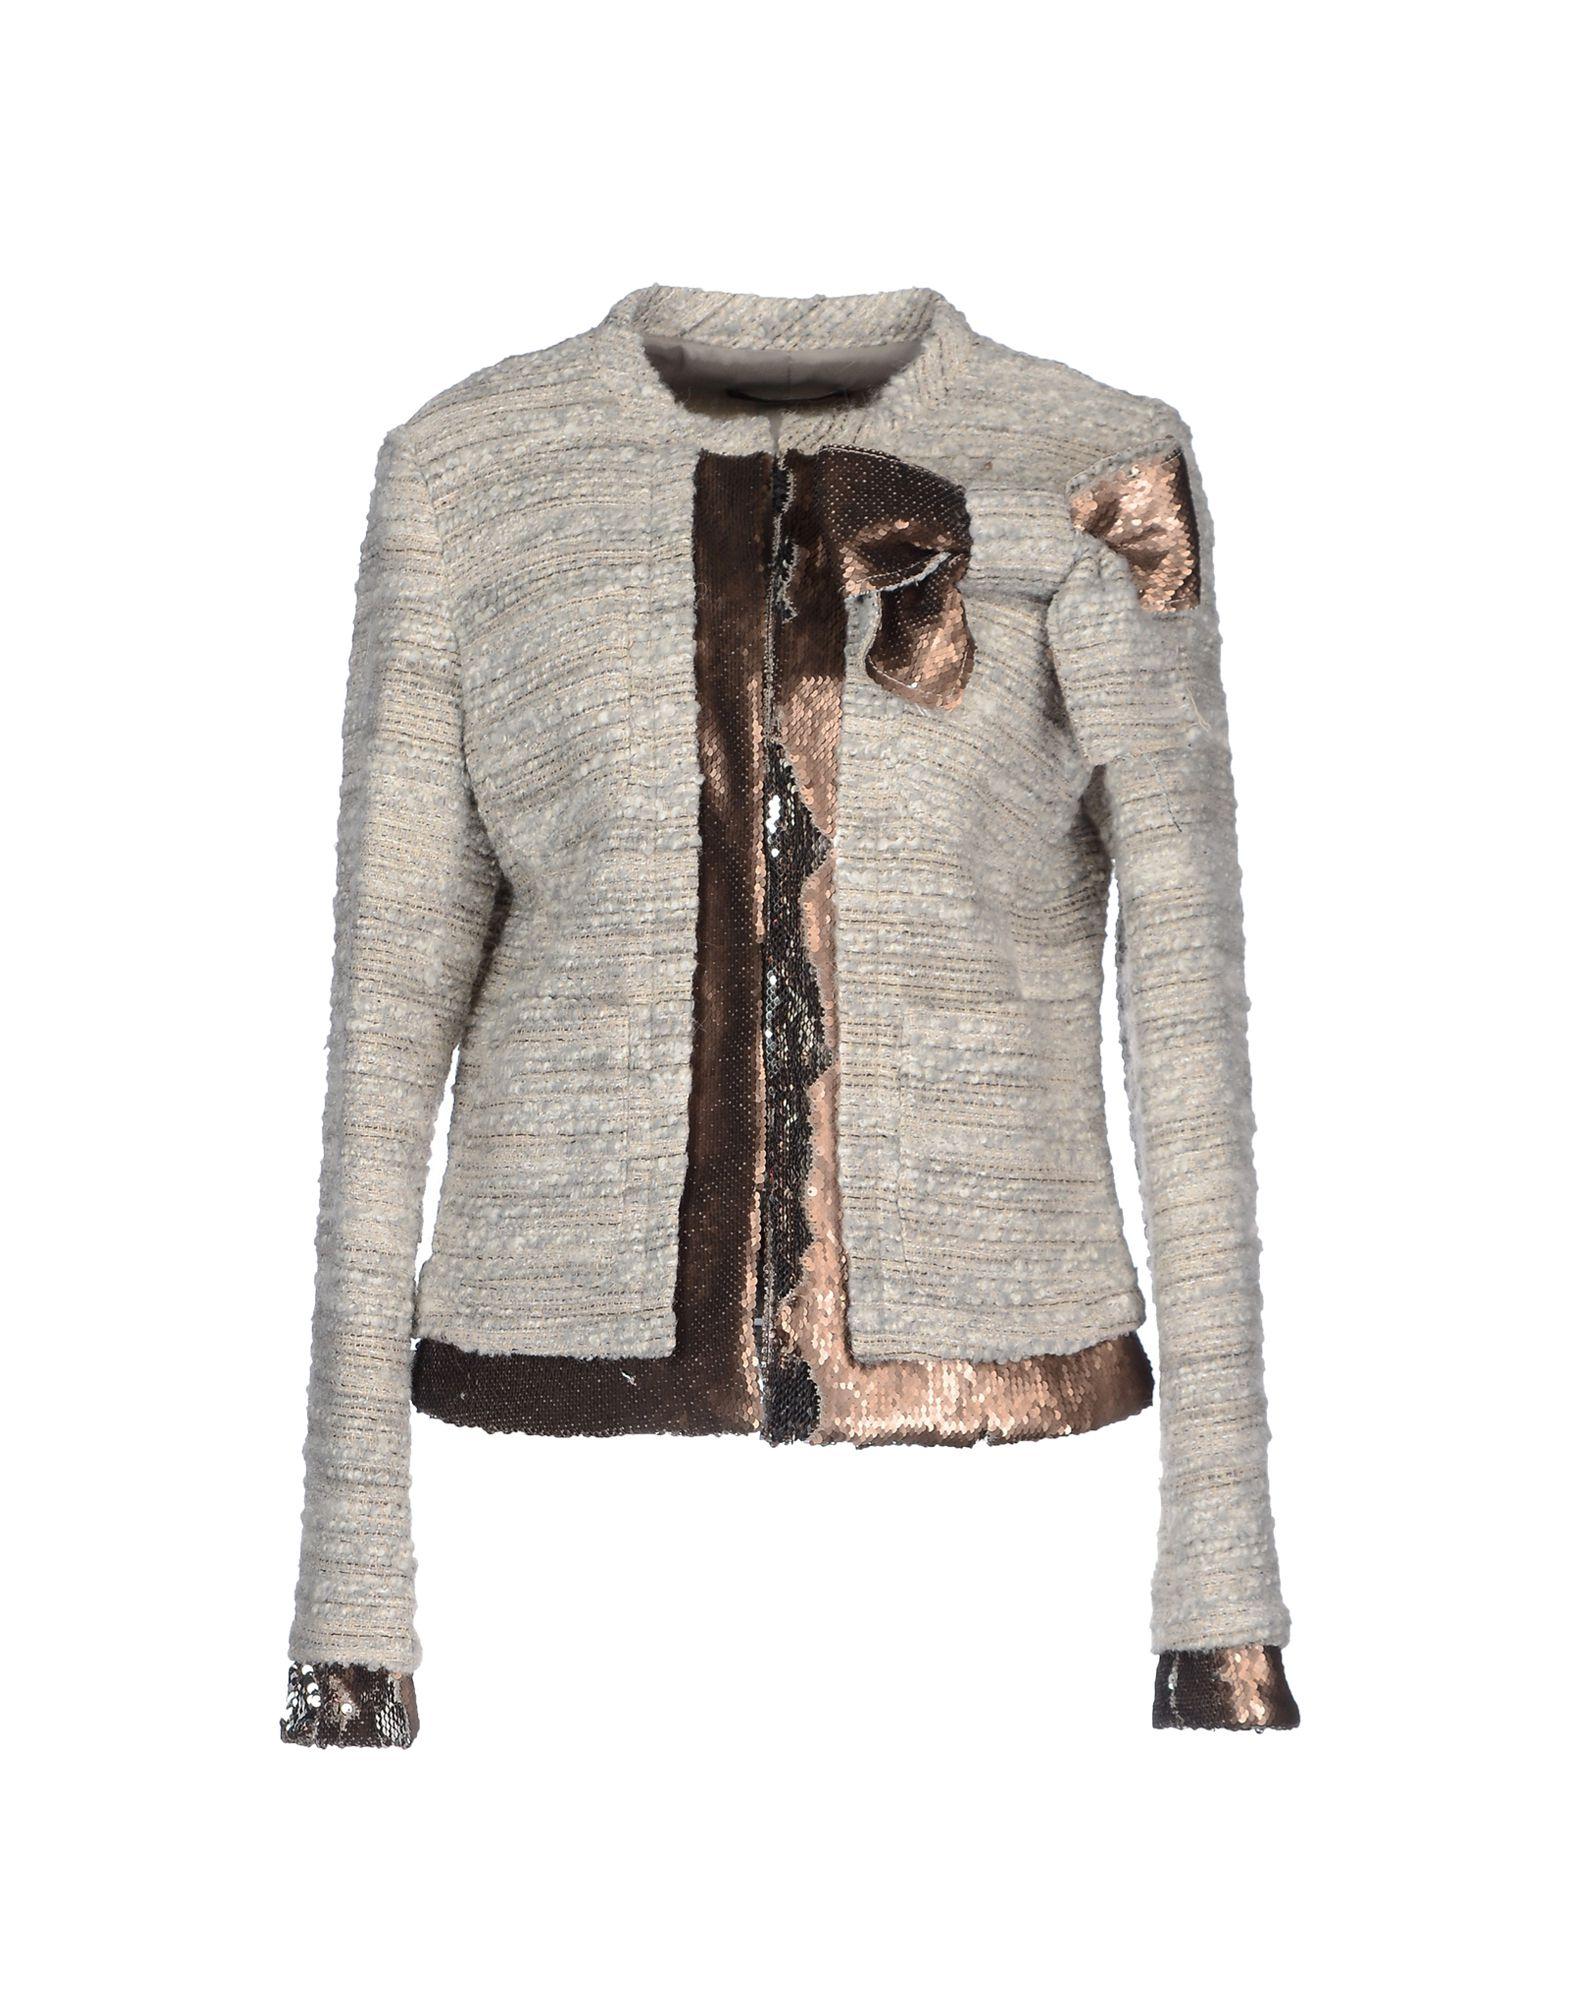 Twin-Set Simona Barbieri Coats & Jackets - Twin-Set Simona Barbieri Women -  YOOX United States